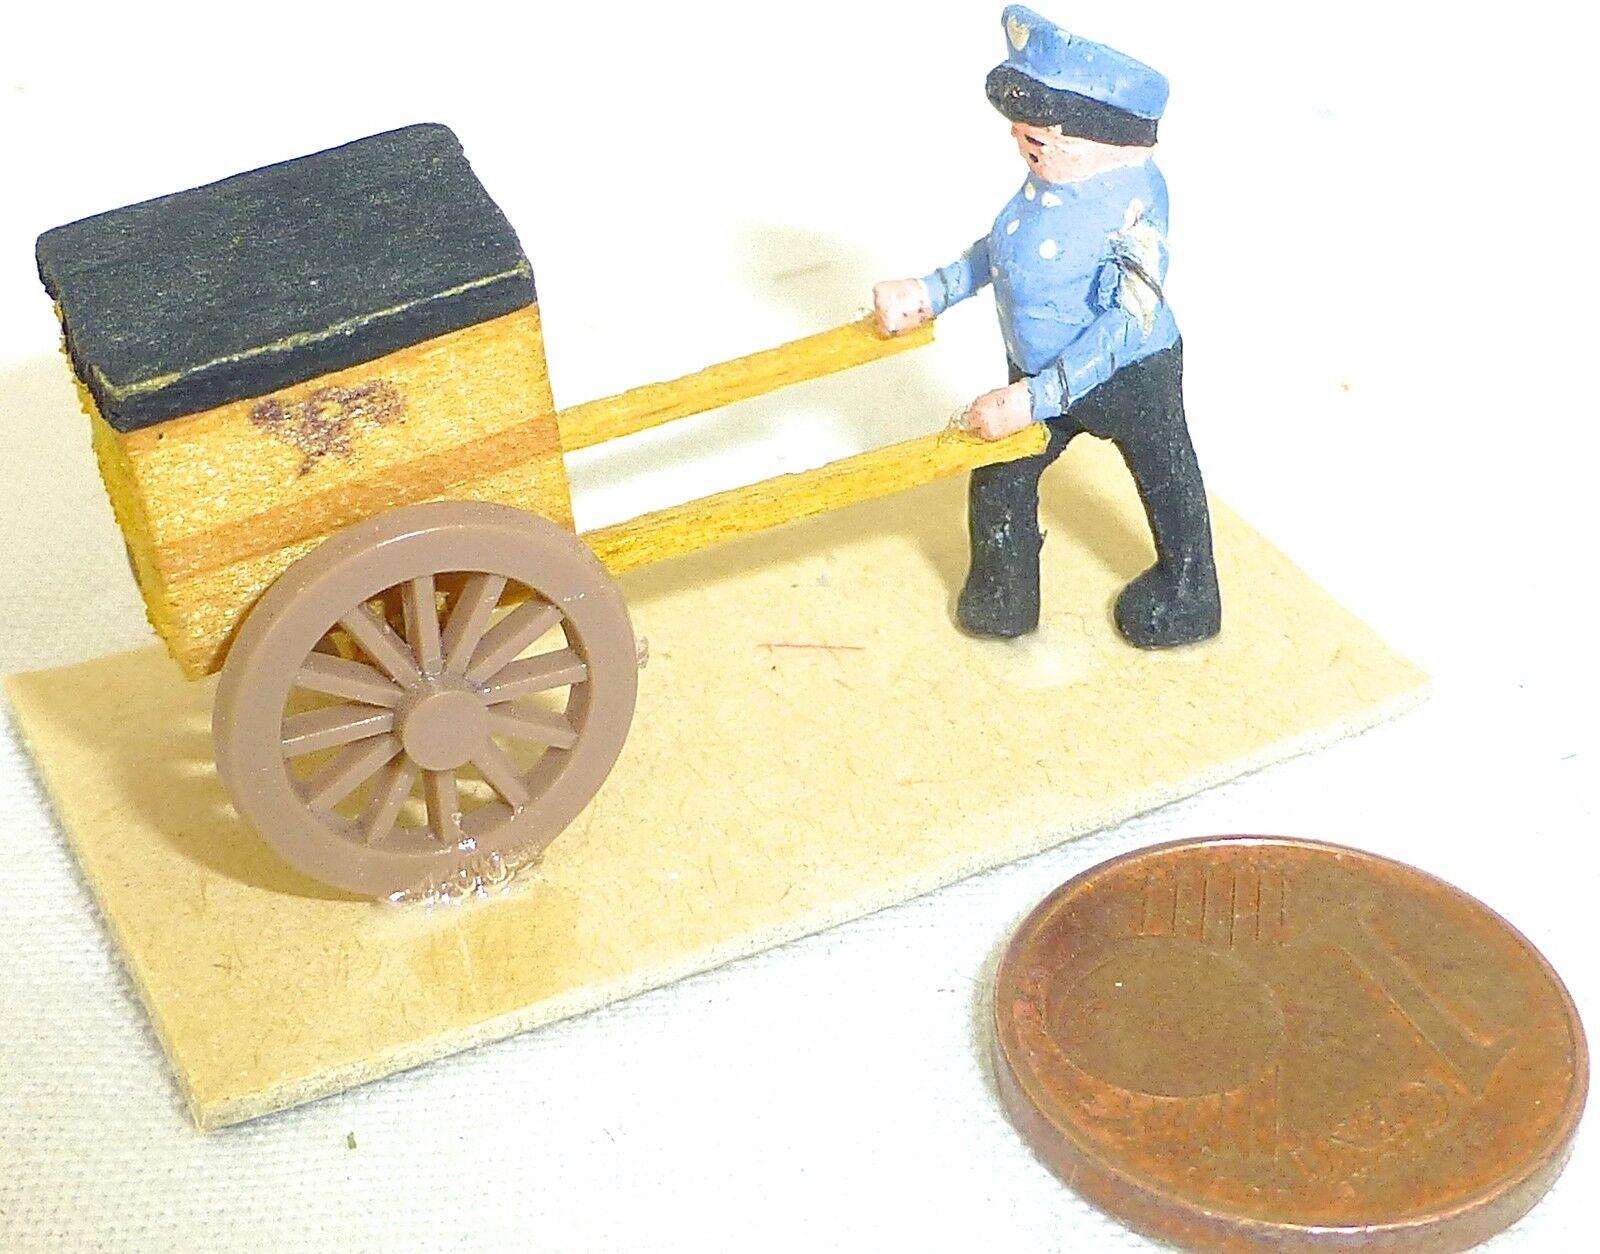 POST Trolley con Schaffner legno Preiser nr 444 1:87 h0 #gd1 pr6 Å *